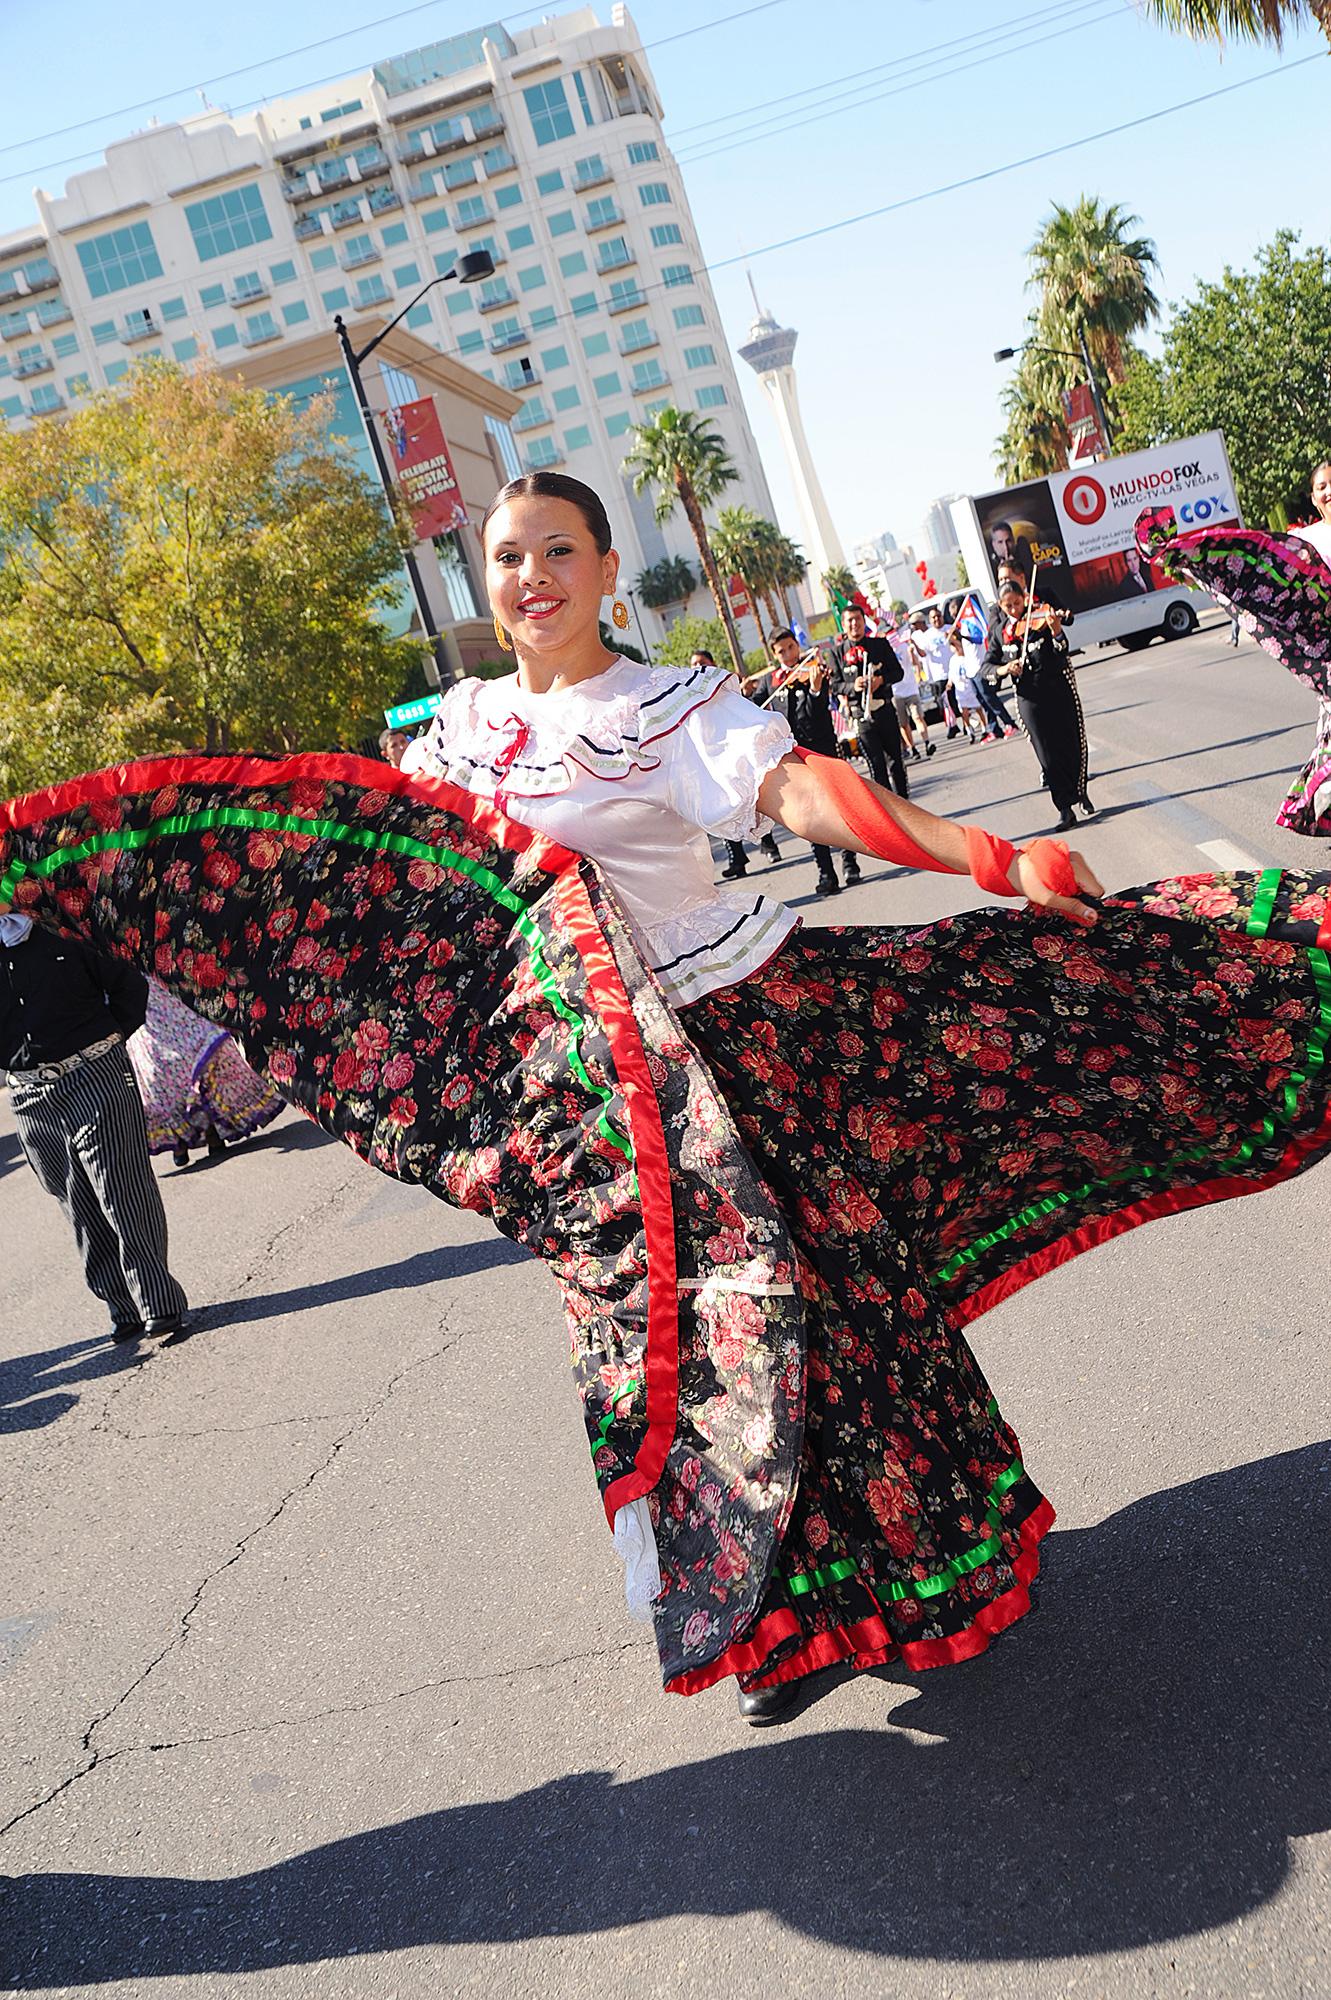 Dancers celebrate El Grito in Las Vegas at Fiesta Las Vegas Latino Parade & Festival